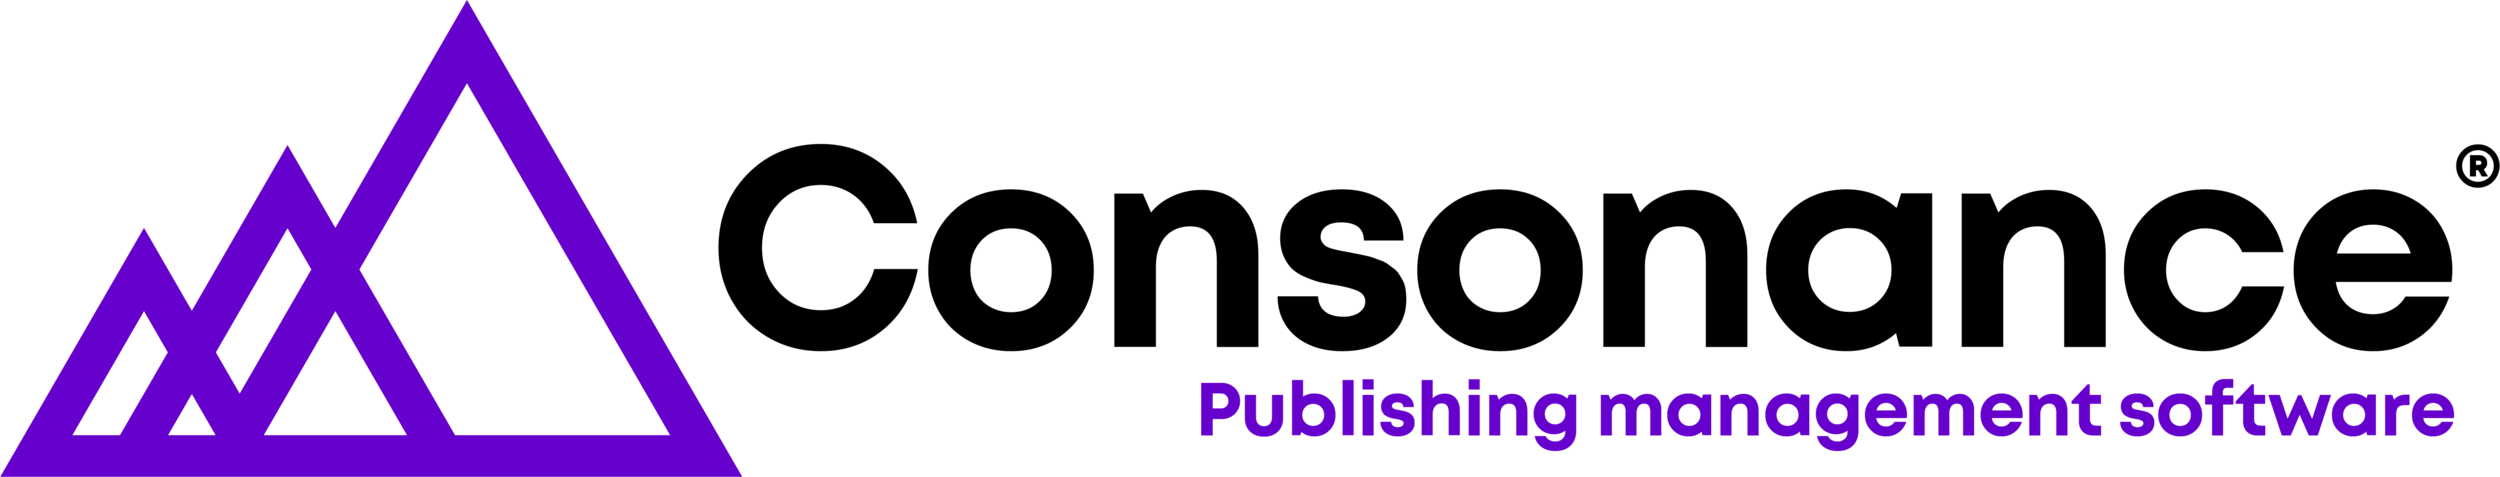 purple-black-long.png